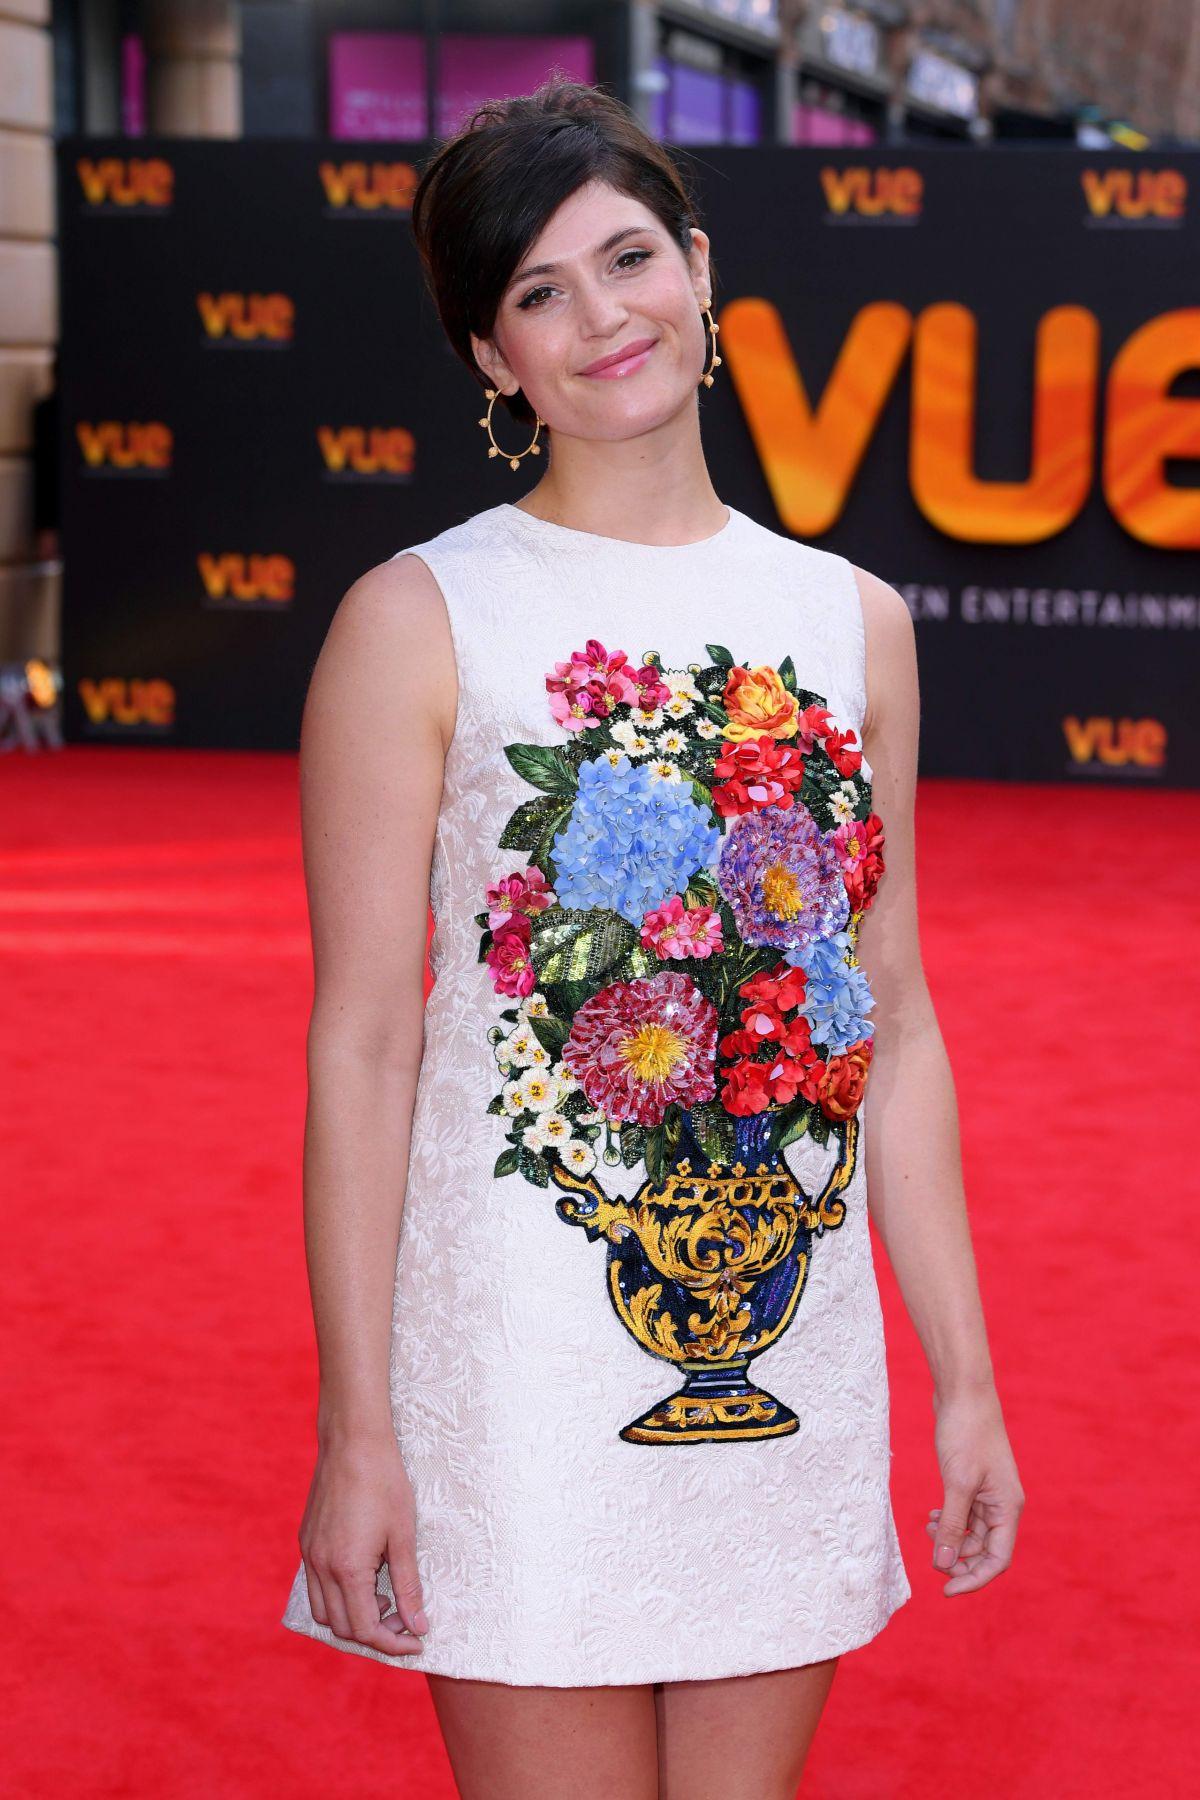 GEMMA ARTERTON at Vue West End Cinema Reopening in London 07/10/2017